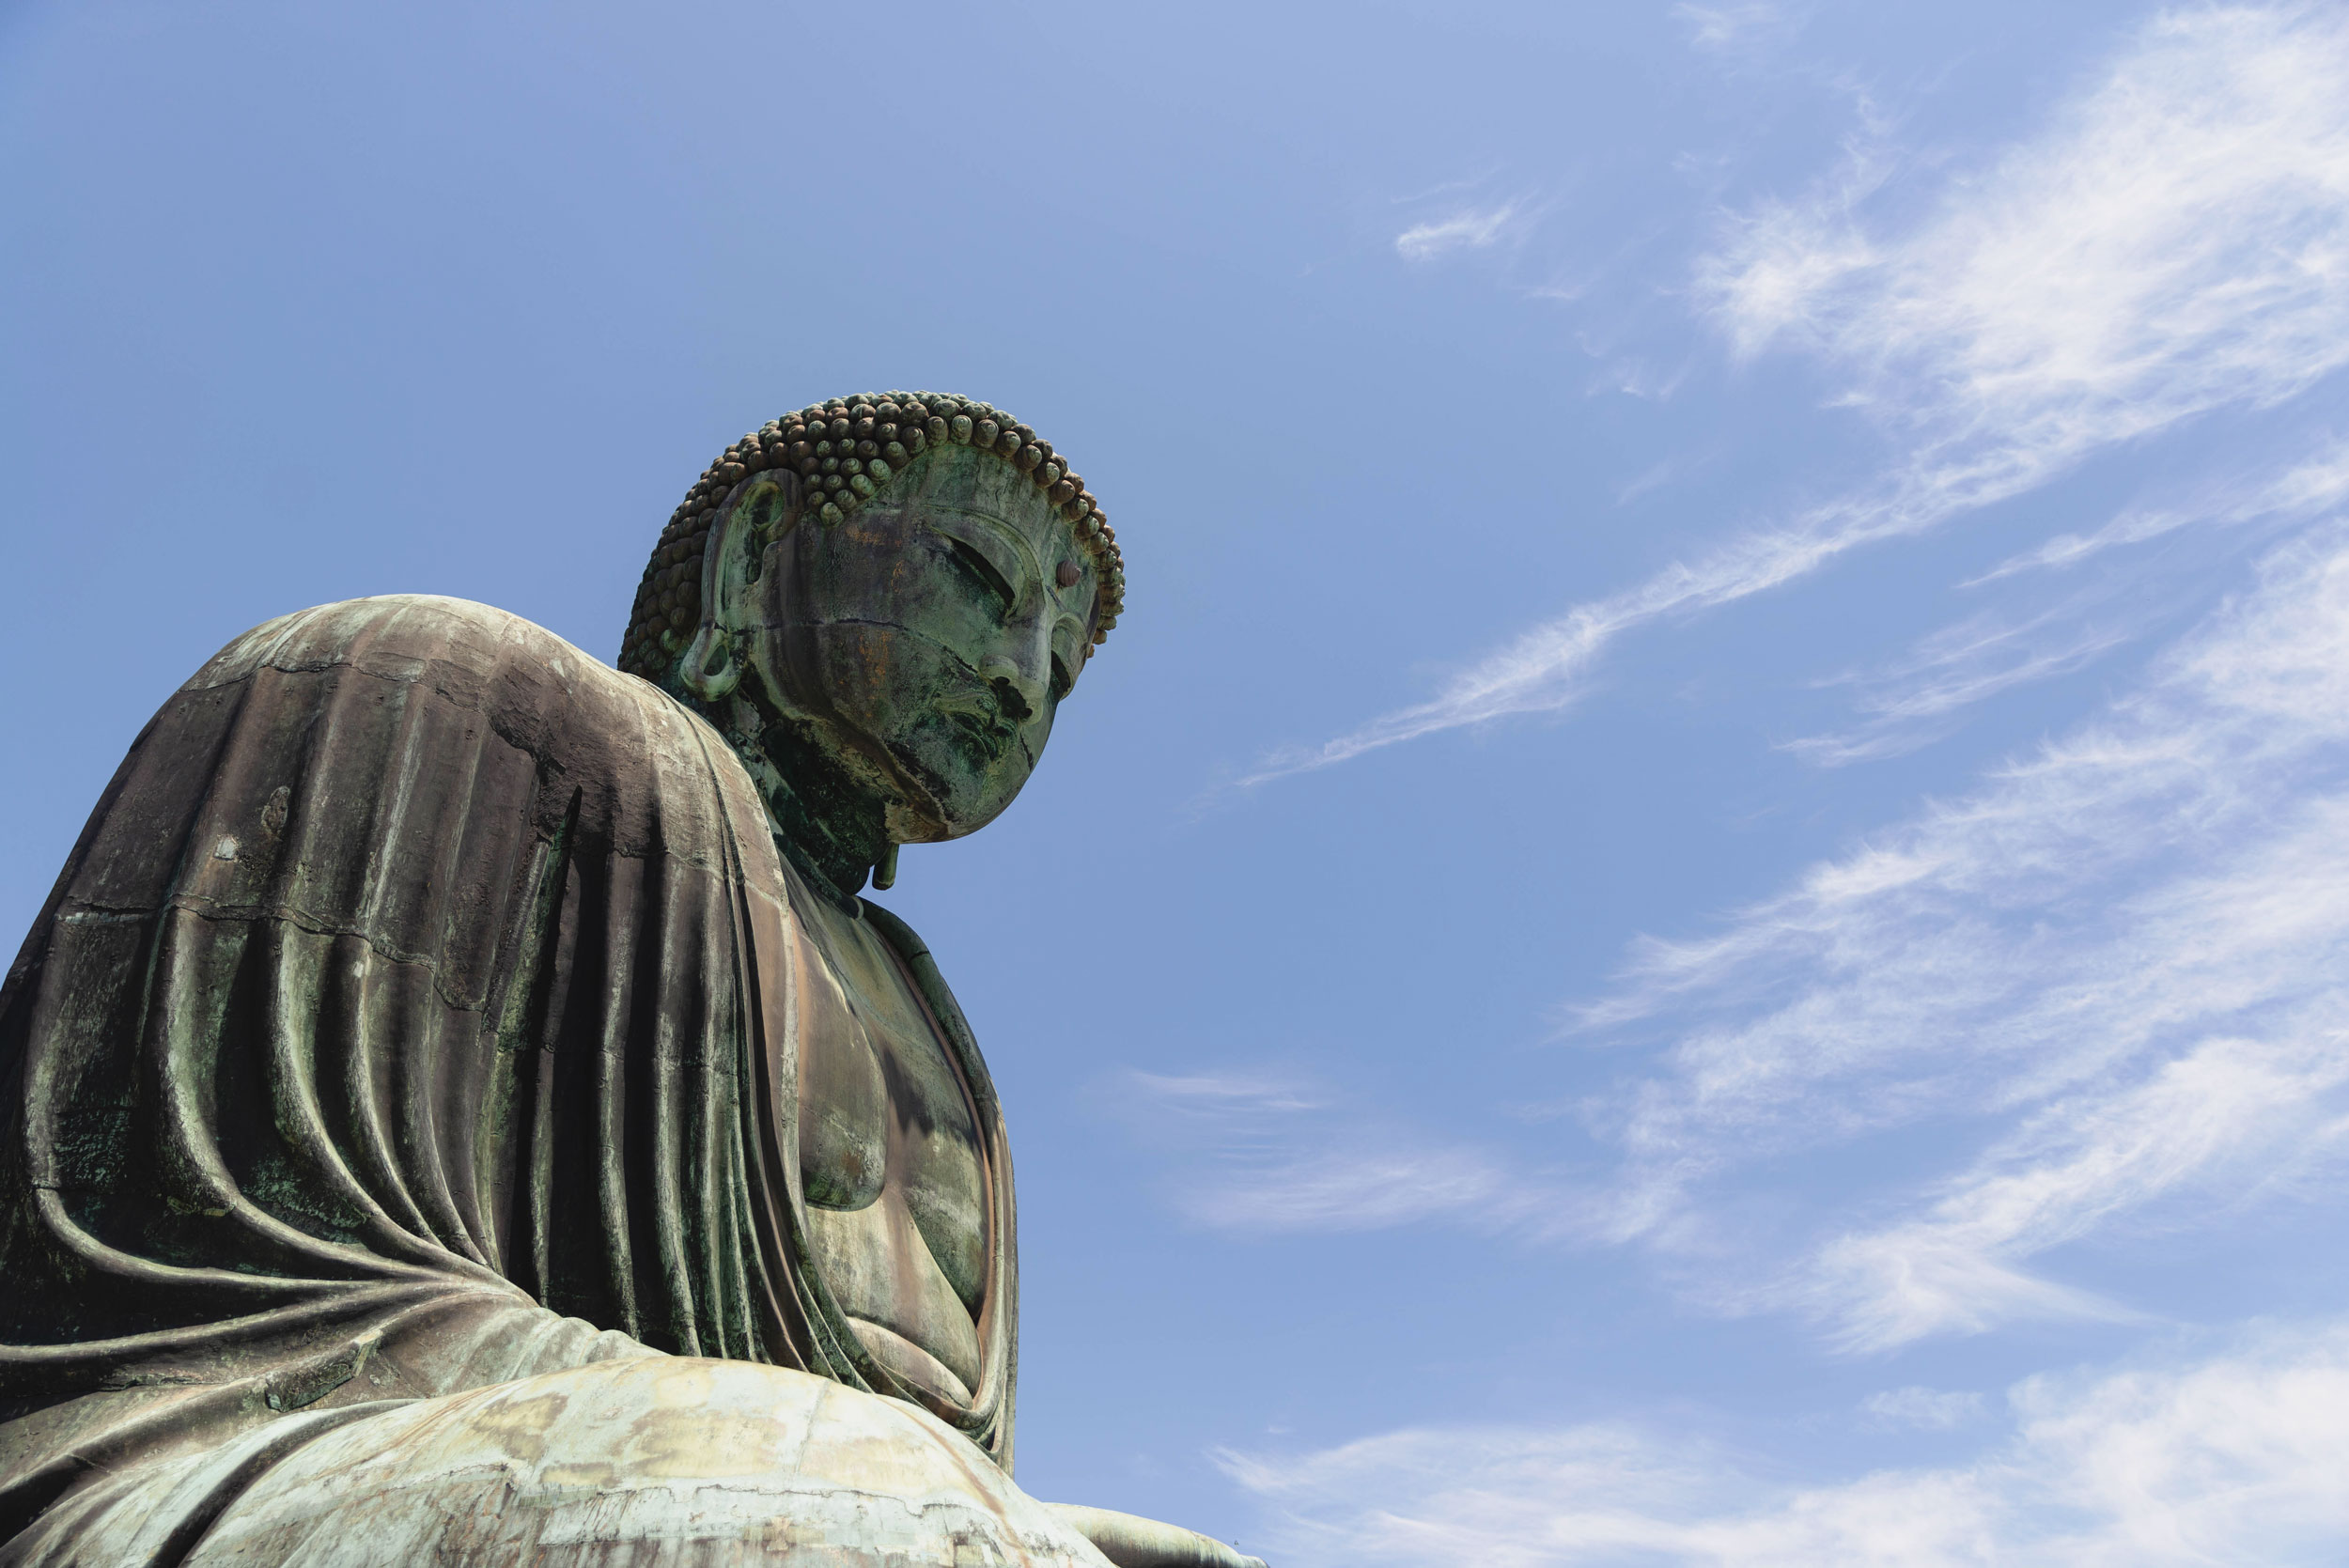 Daibutsu Buddha statue in Kamakura